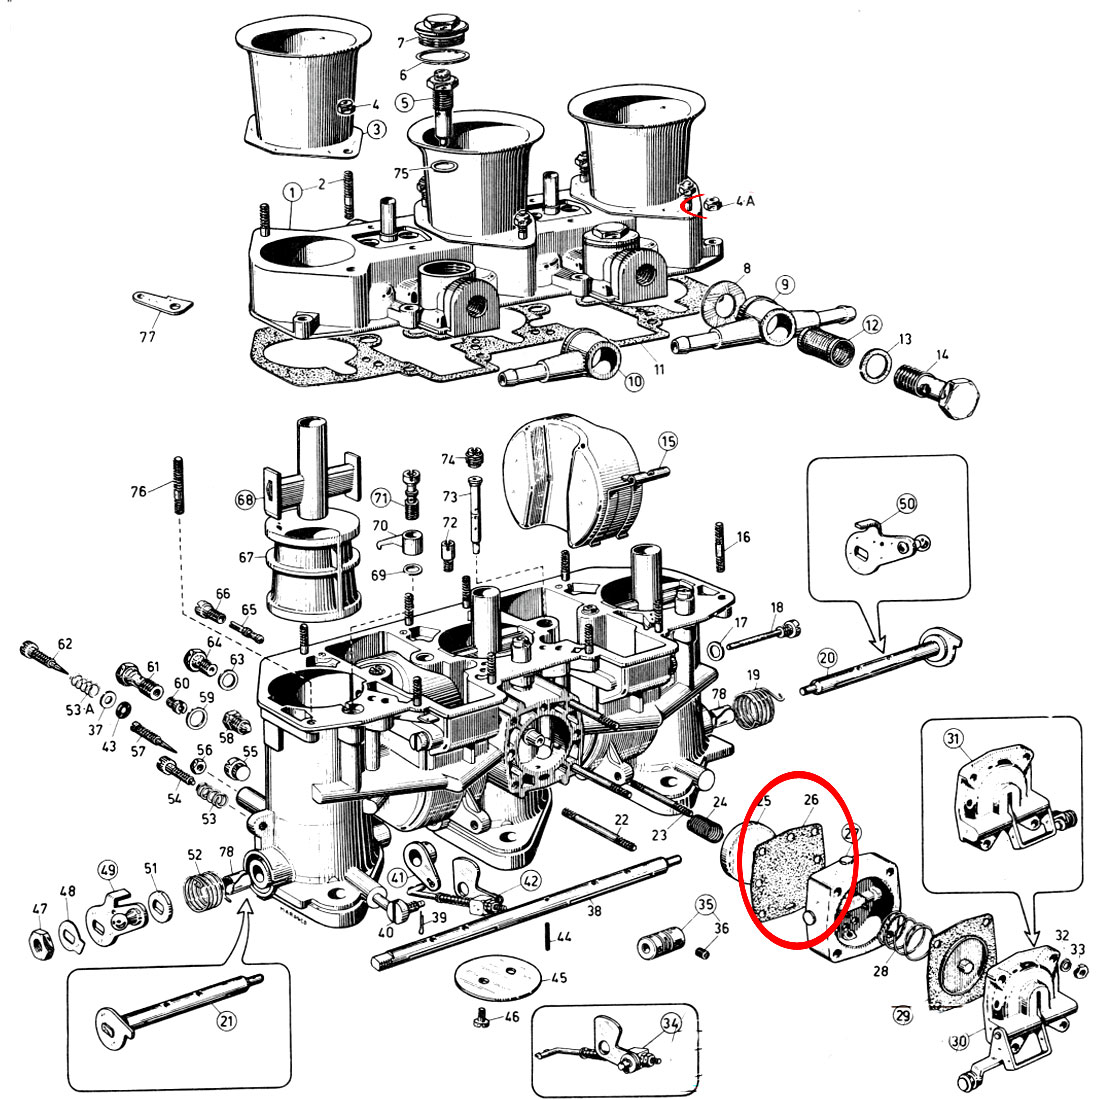 ford motorcraft carburetors imageresizertool com ford 2100 carburetor vacuum diagram motorcraft 2100 carburetor diagram [ 1098 x 1100 Pixel ]